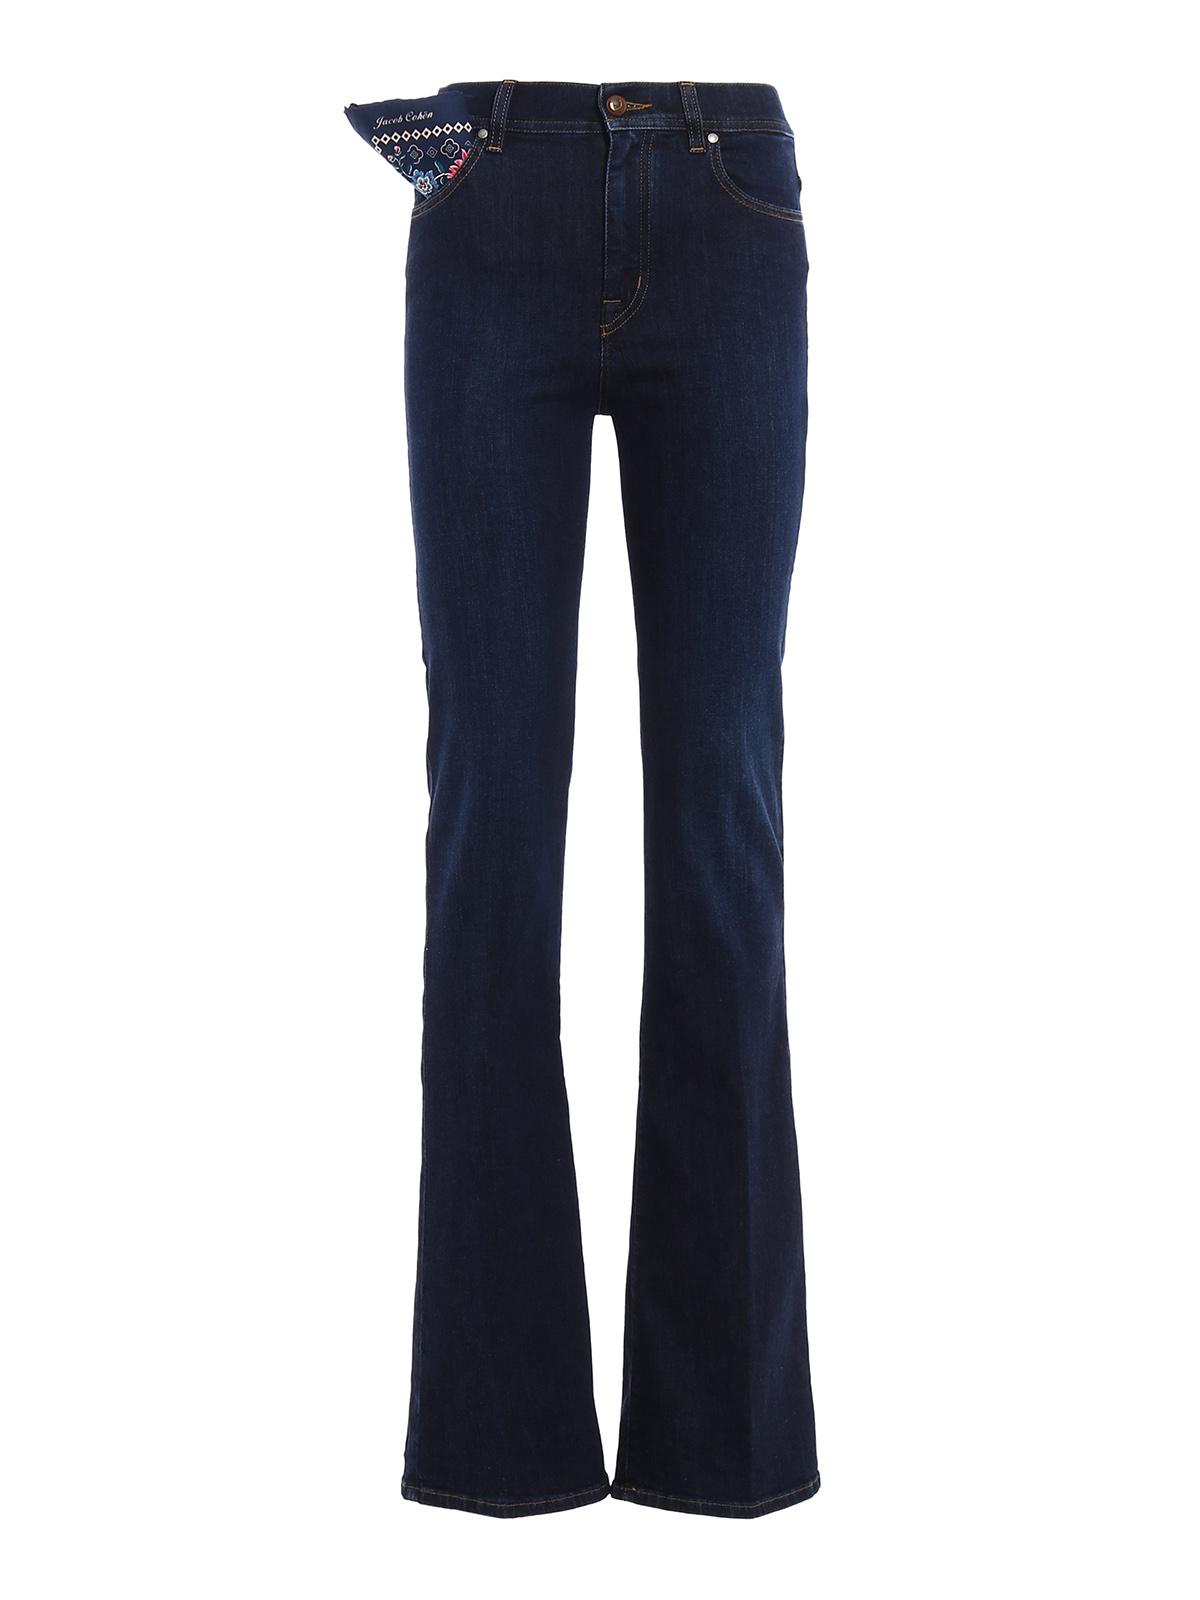 linda high rise jeans by jacob cohen bootcut jeans ikrix. Black Bedroom Furniture Sets. Home Design Ideas